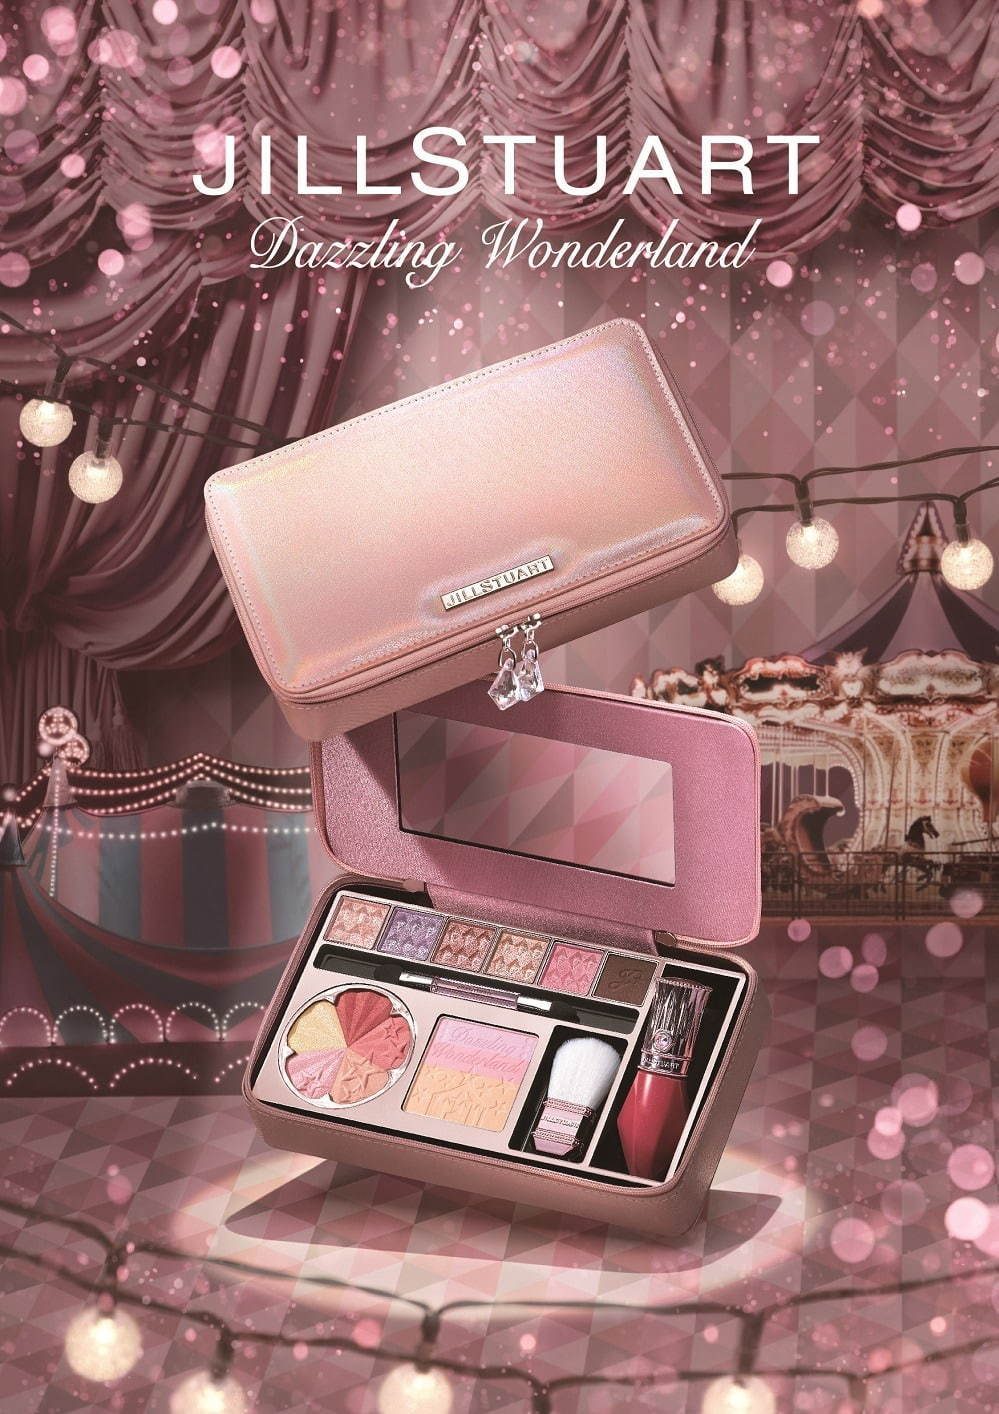 JILL STUART Beauty2020 dazzling wonderland ダズリングワンダーランド